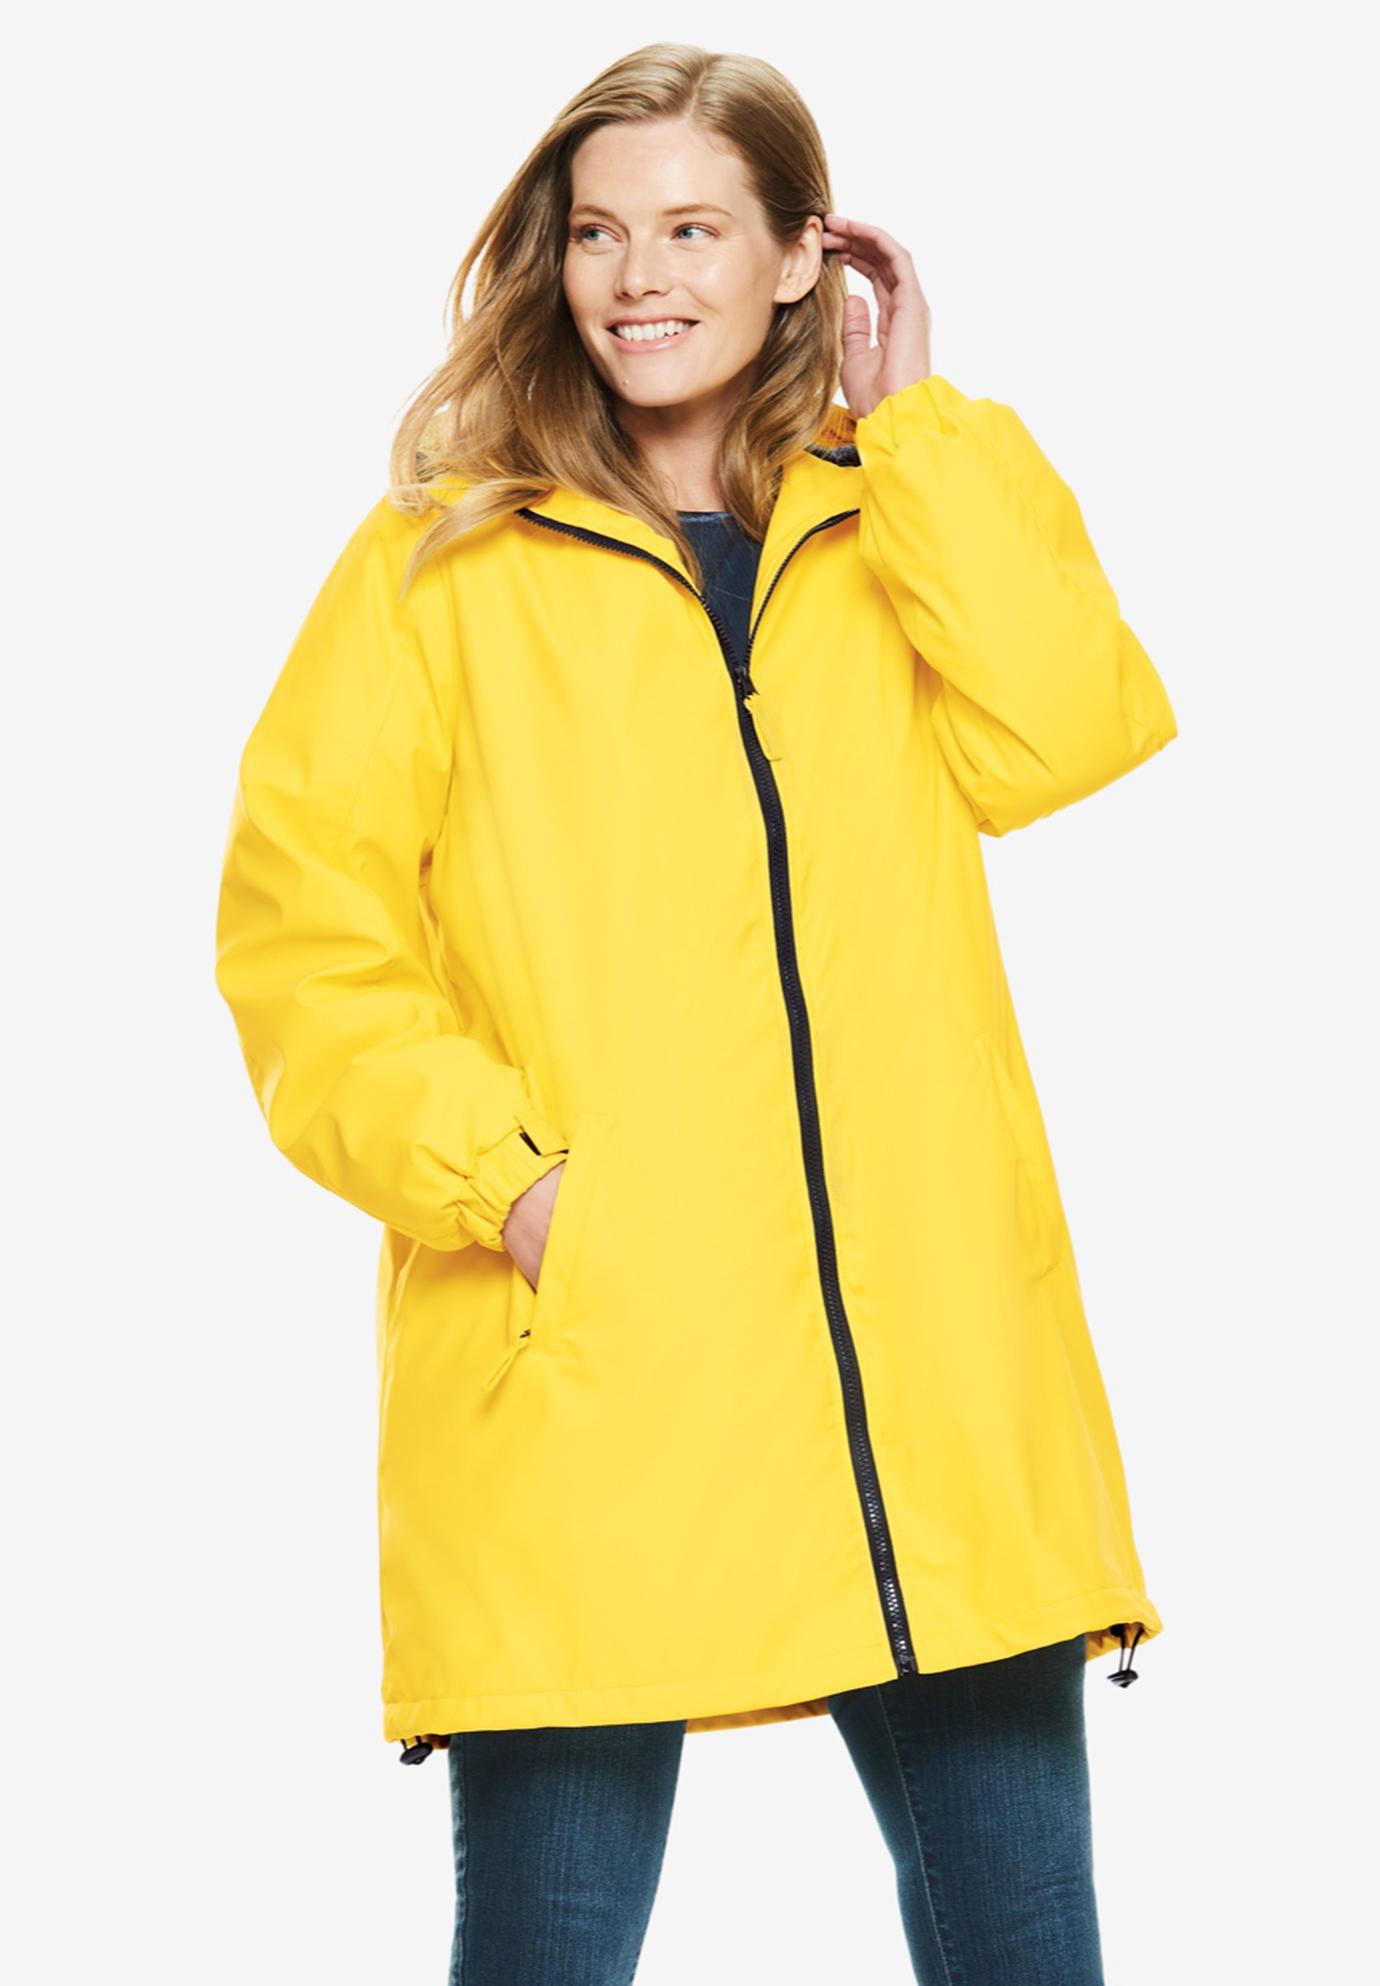 Monogrammed girls hot pink raincoat teen rain jacket youth